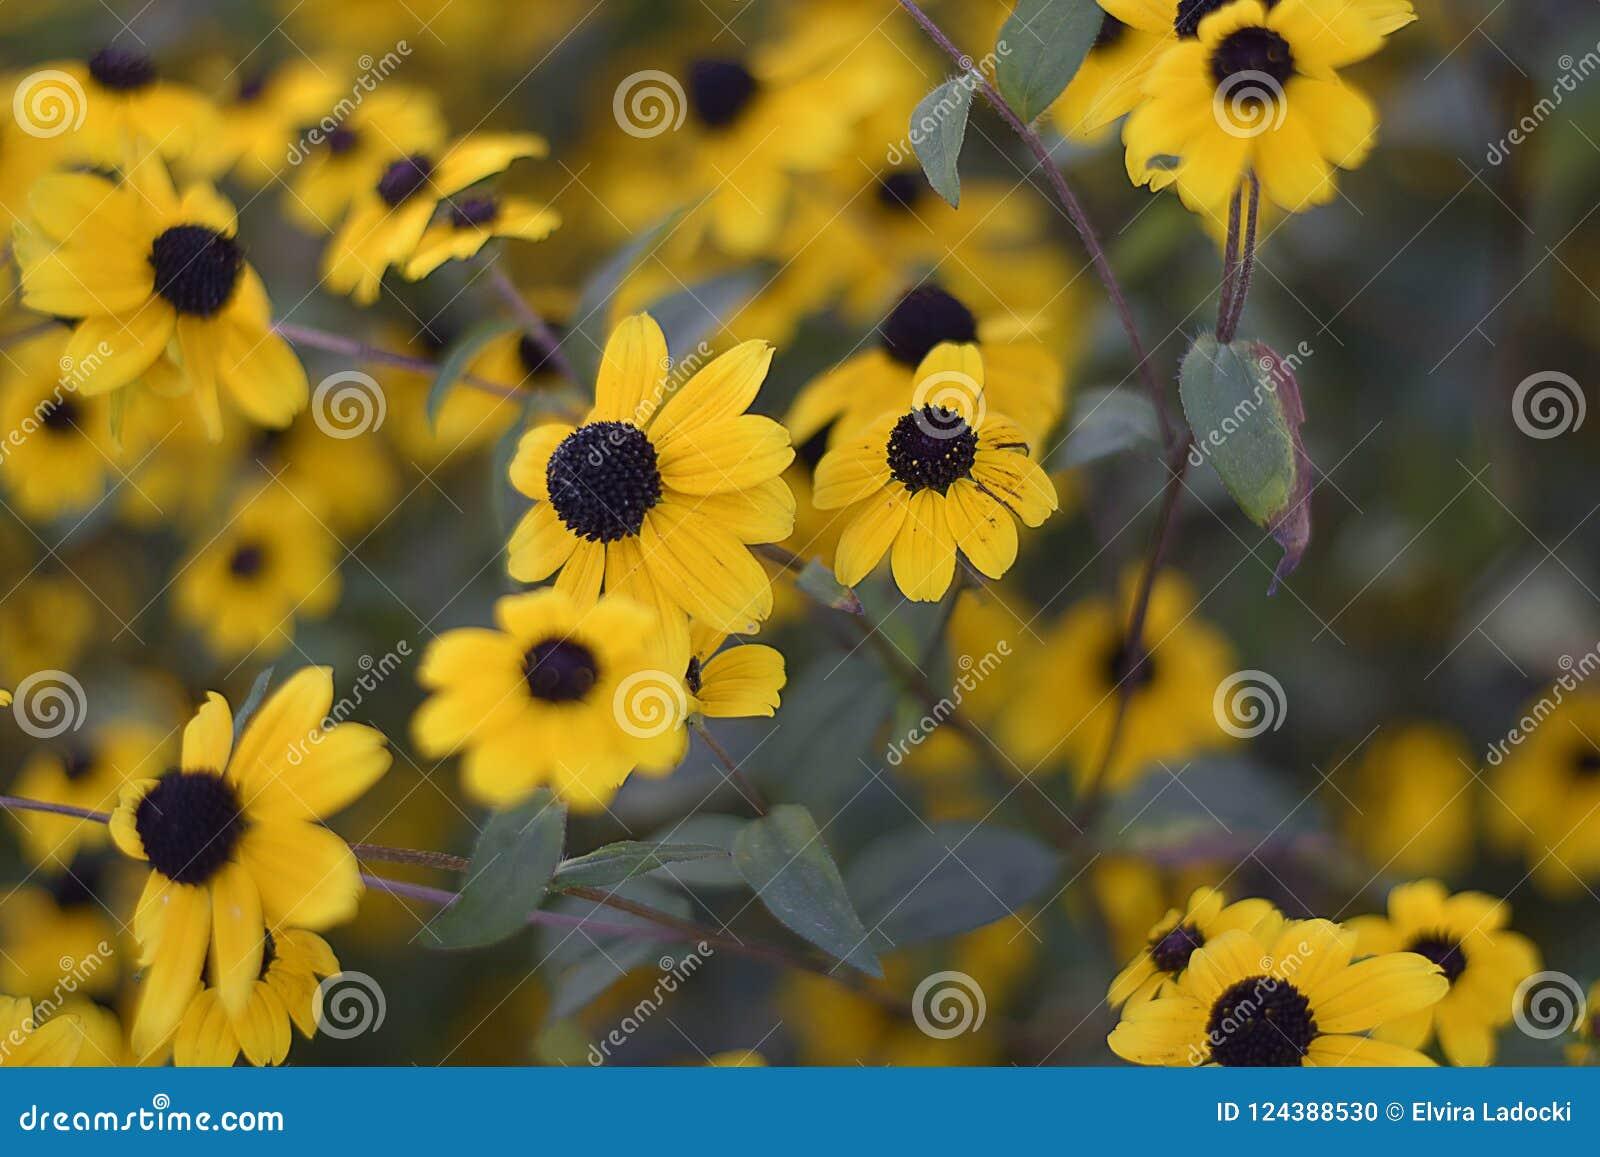 Beautiful yellowl summer flowers close up in my garden stock photo very pretty yellow summer flowers close up in the sunshine in my garden mightylinksfo